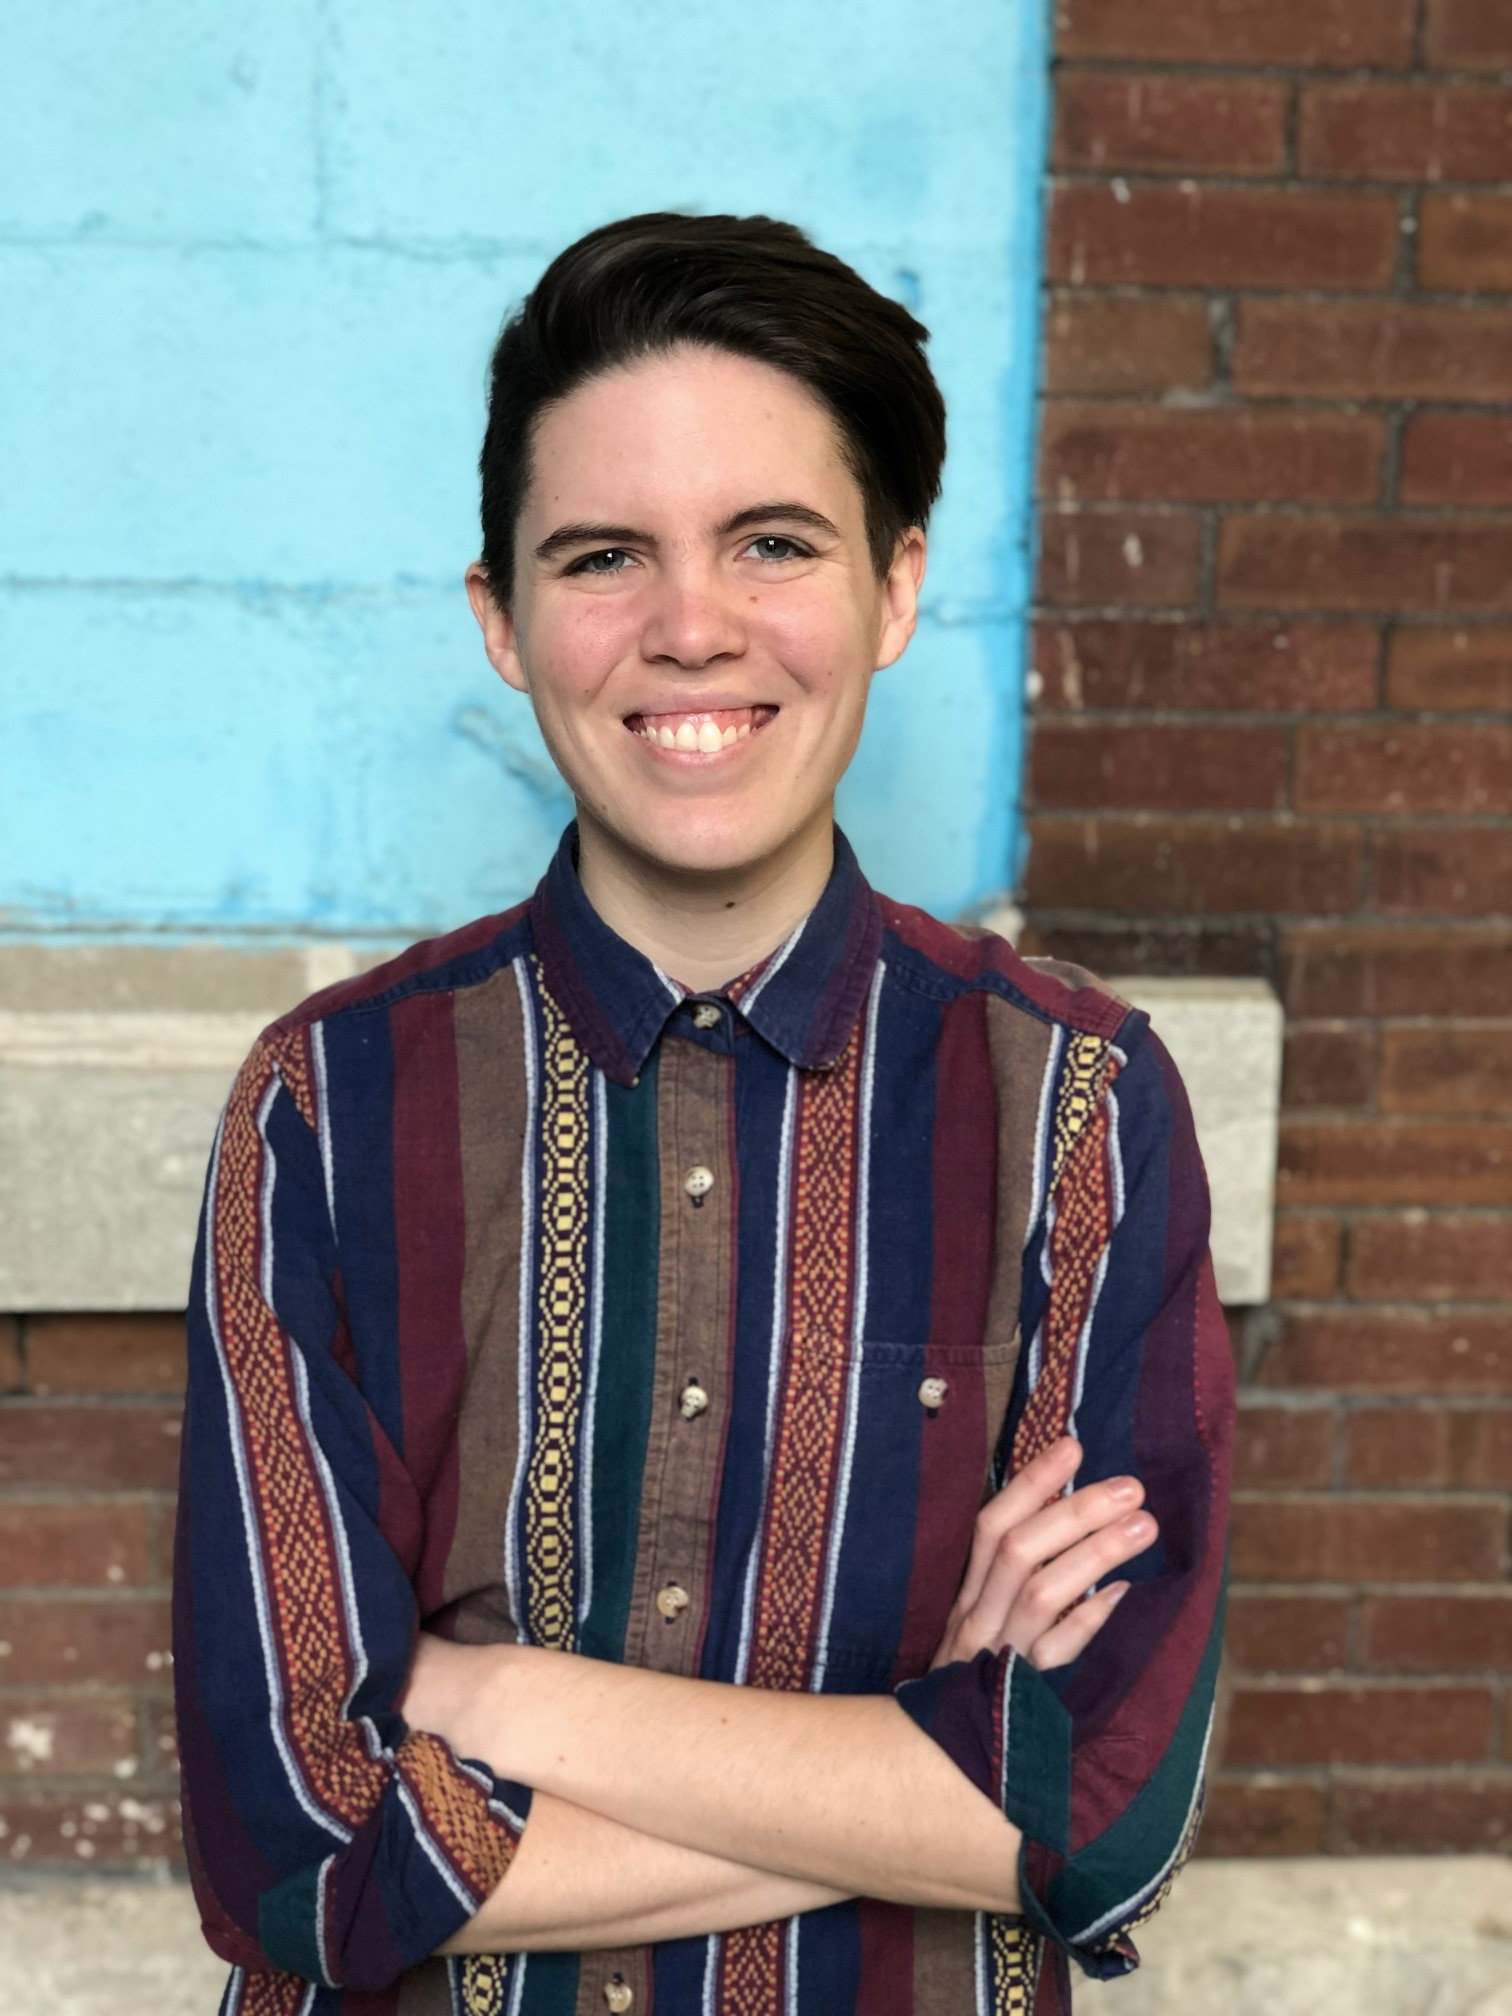 Beth Watkins - Program Managerbeth@irwpstl.org